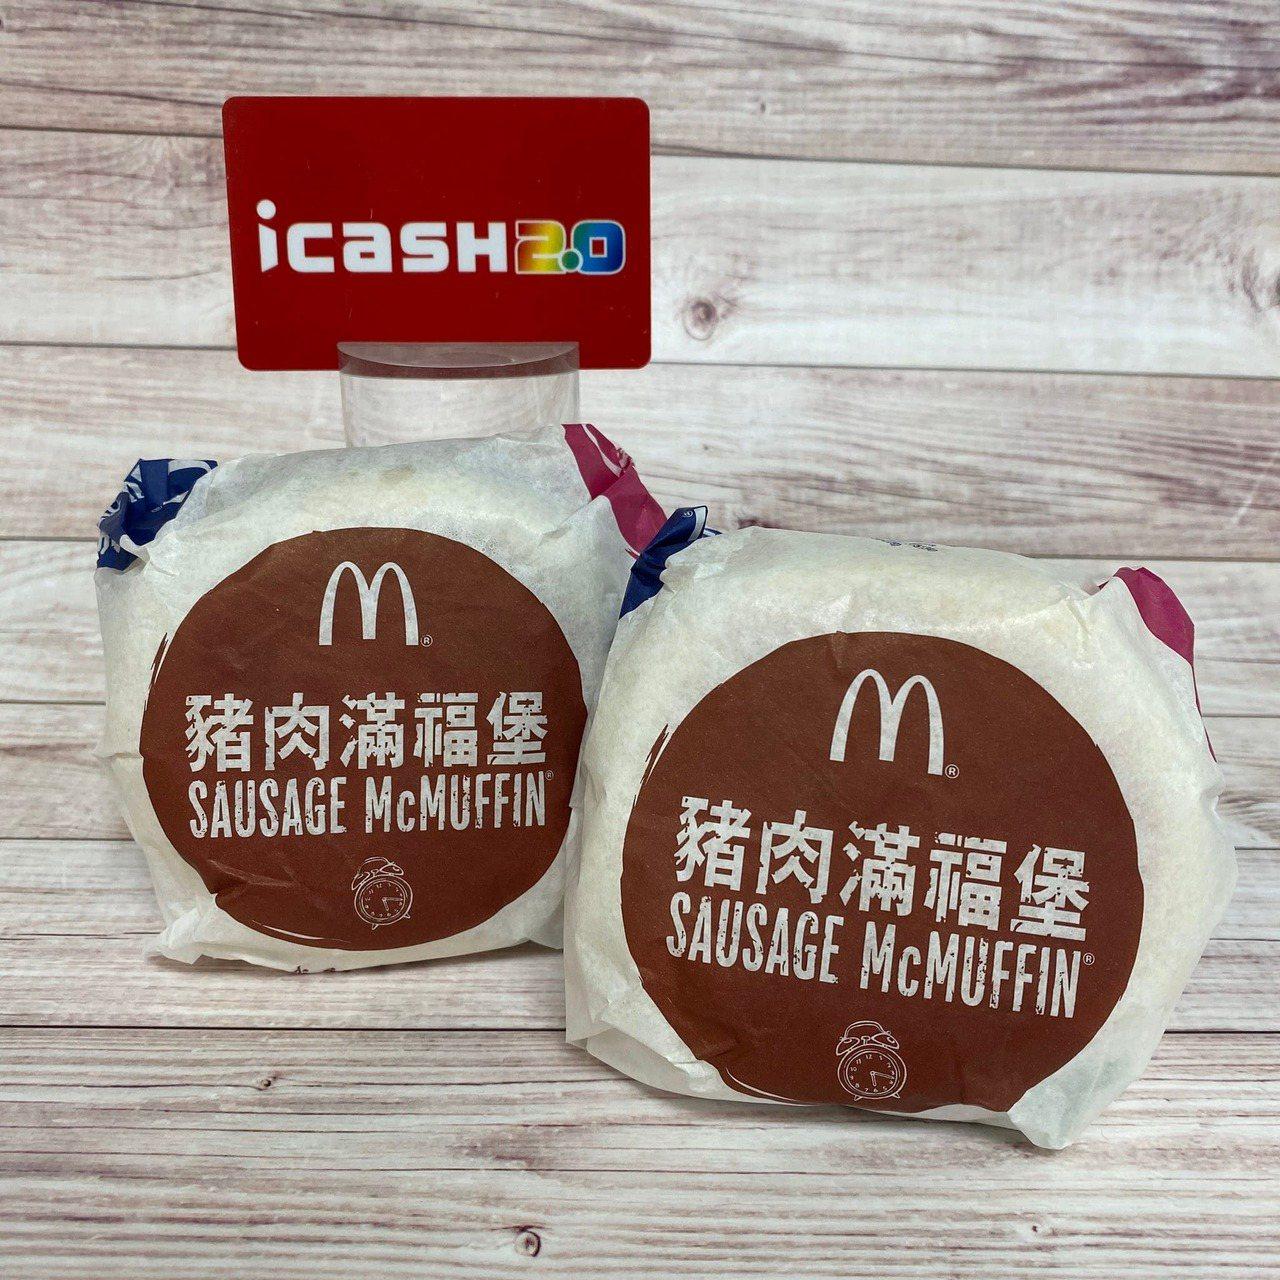 icash推出麥當勞餐廳豬肉滿福堡買一送一再贈10倍OPEN_POINT。圖/愛...